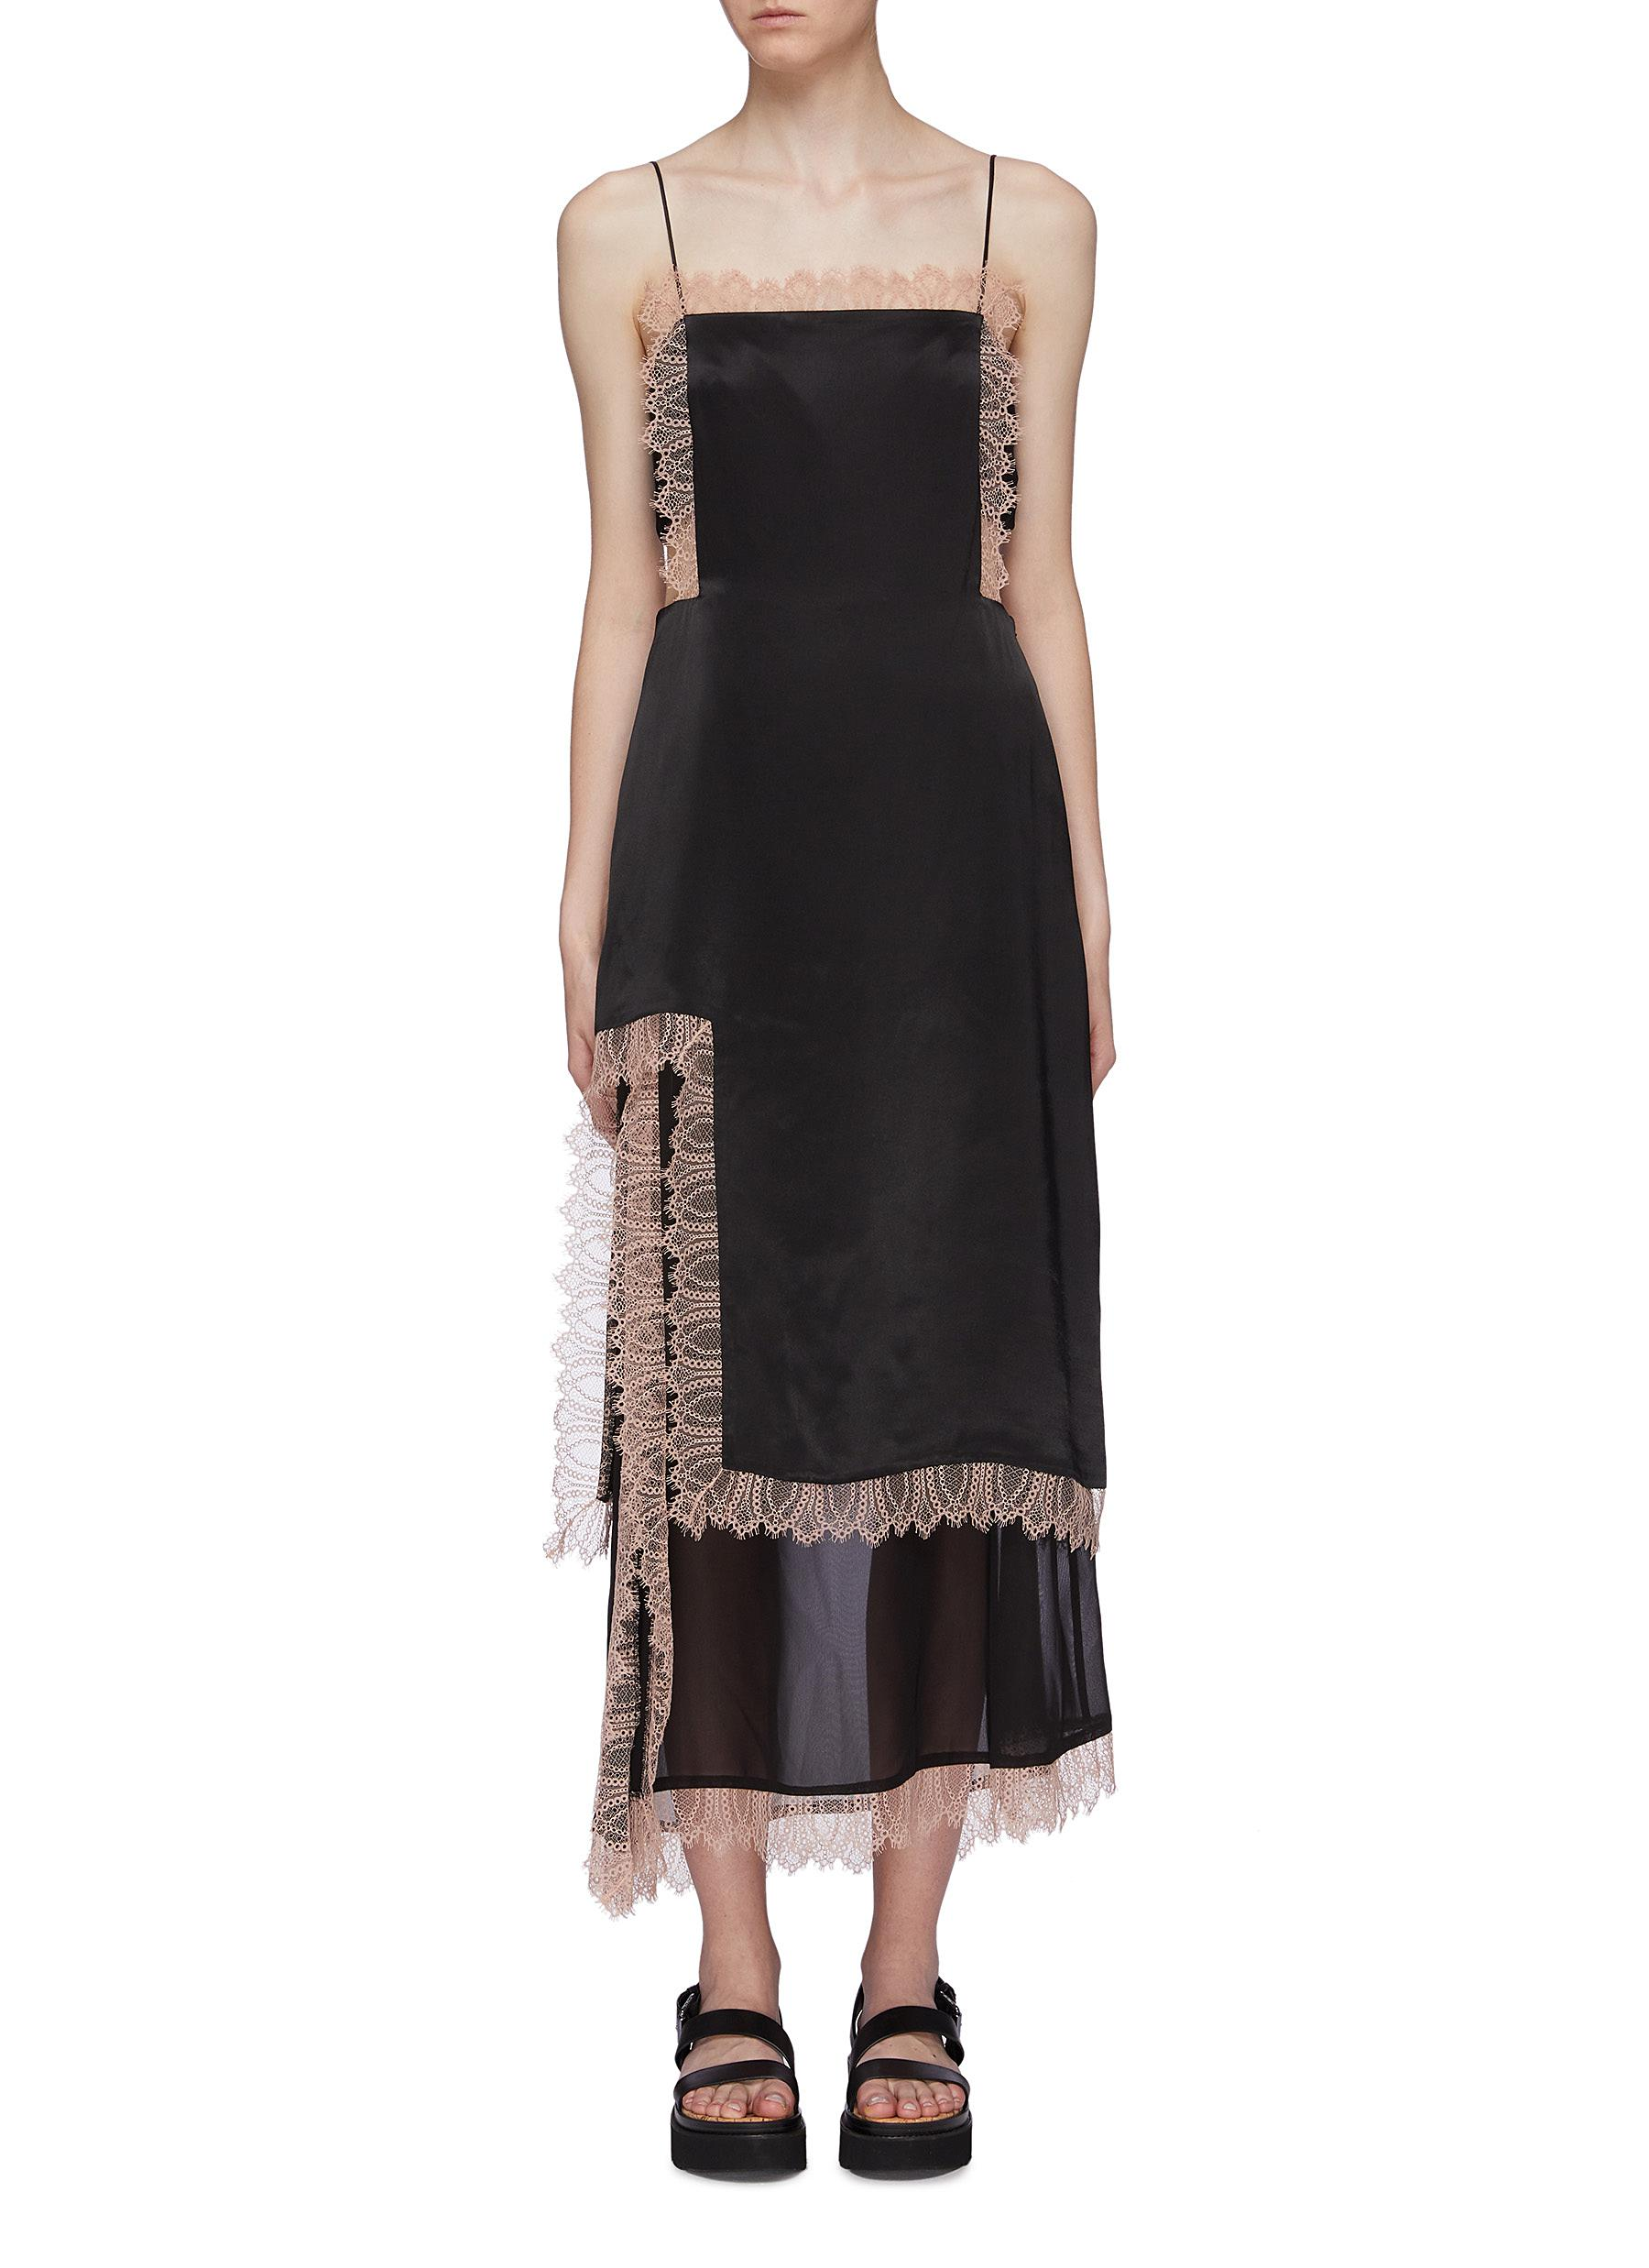 Lace trim chiffon slit hem satin camisole dress by 3.1 Phillip Lim